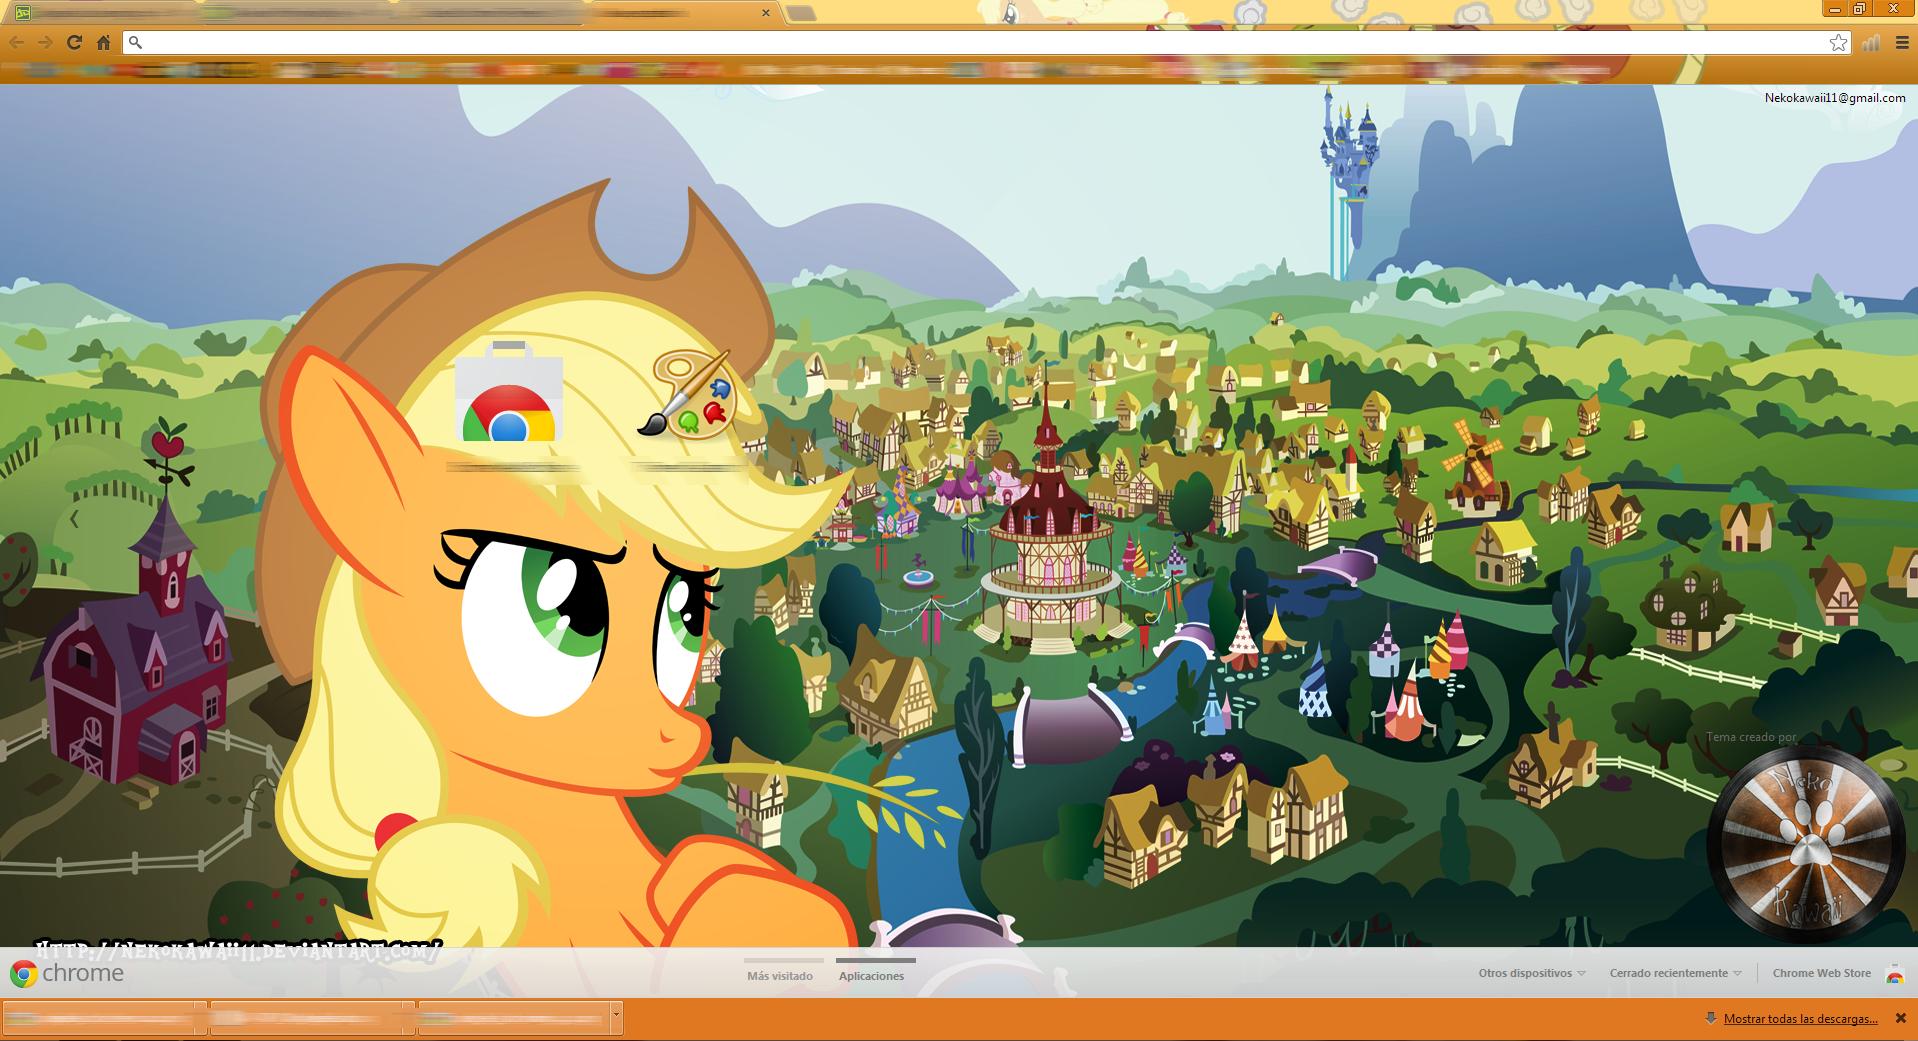 Google themes kawaii -  Updated Applejack Google Chrome Theme By Nekokawaii11